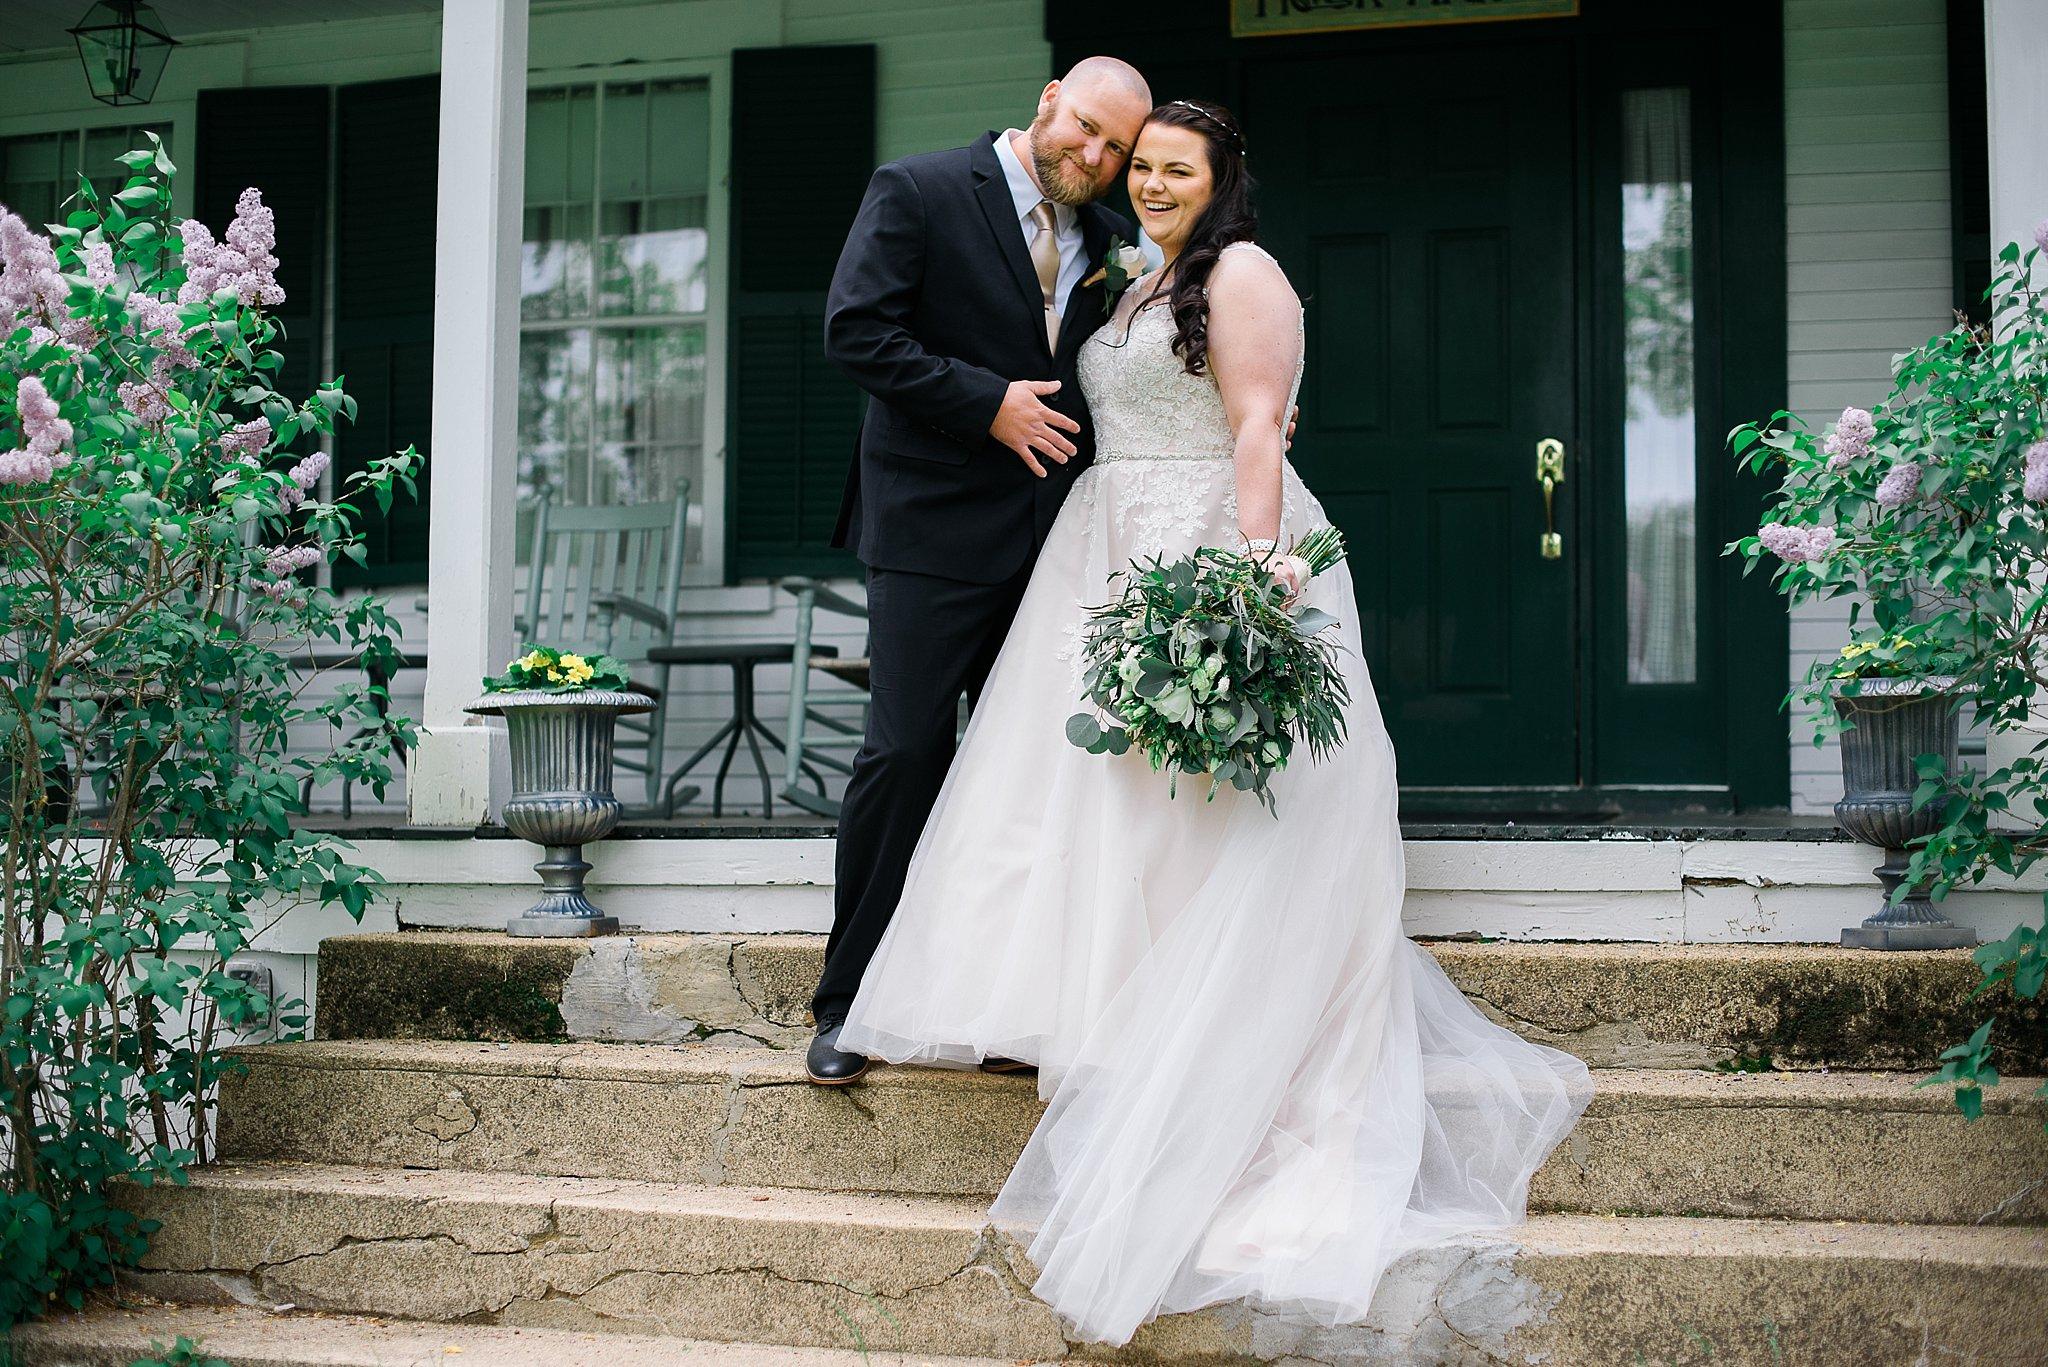 Preserve at Chocorua Tamworth NH Wedding May Wedding New Hampshire Wedding 66.jpg